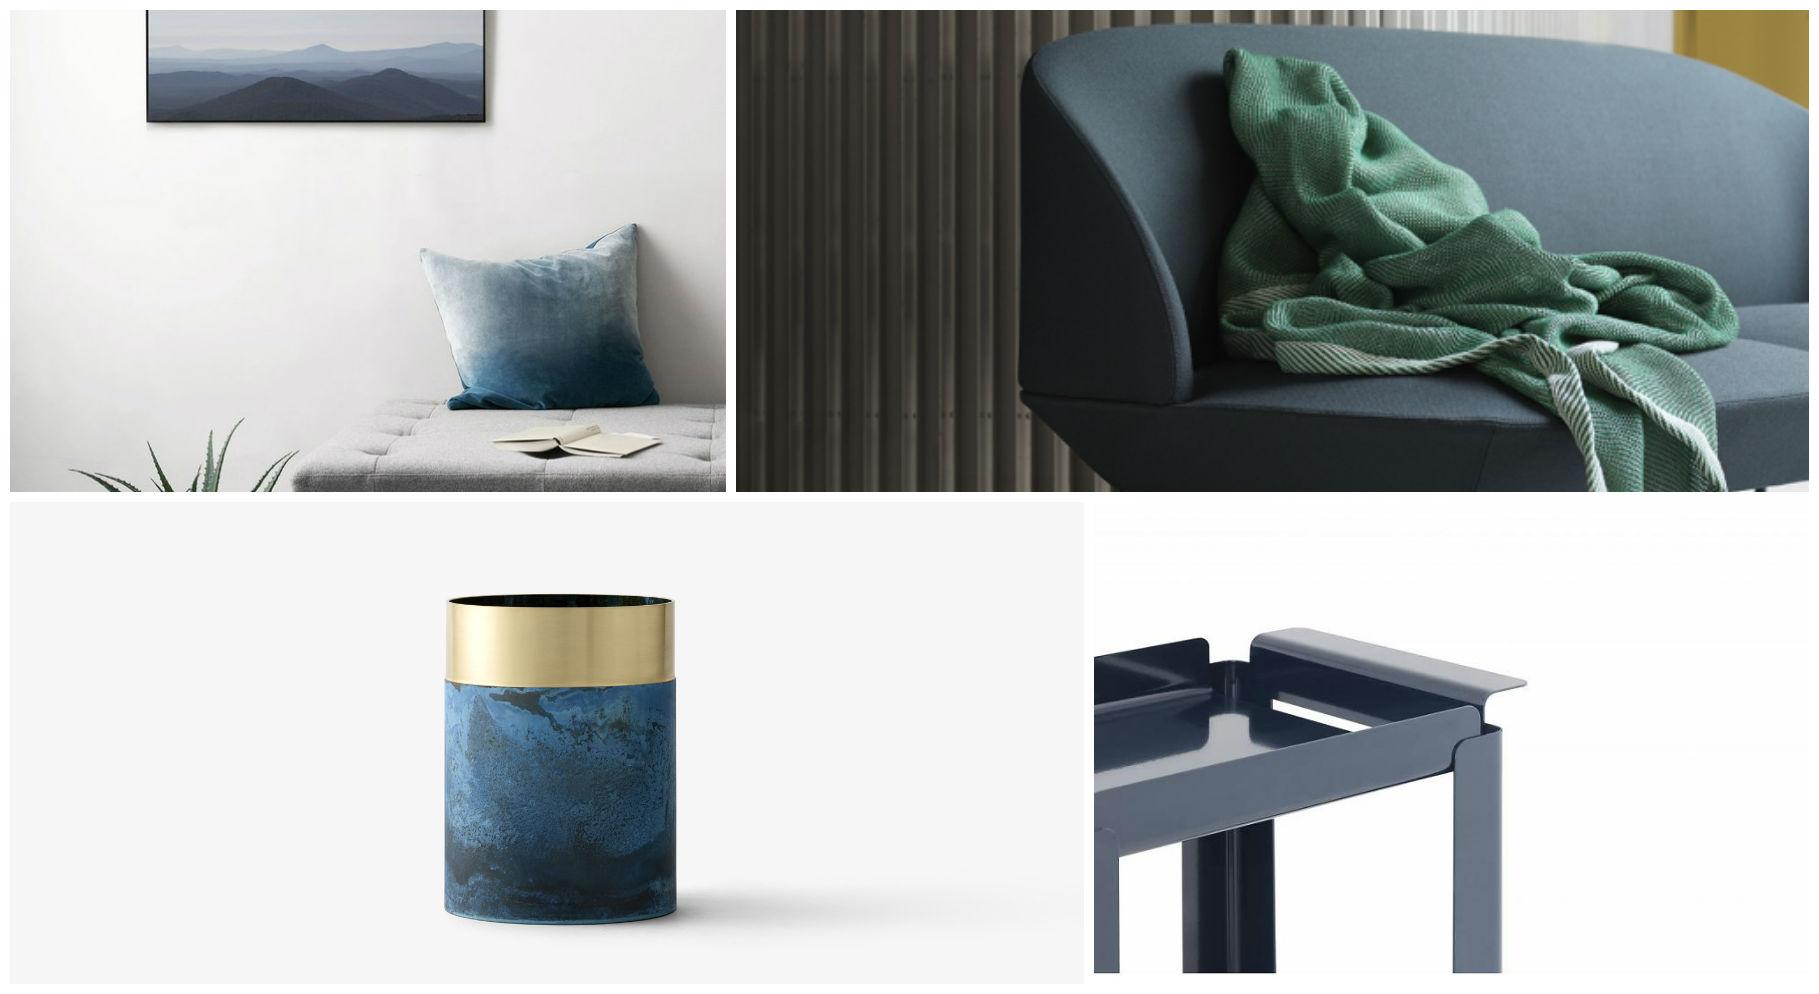 Drei farbtrends 2017 f r eure wohnung designs2love for Farbauswahl wohnung